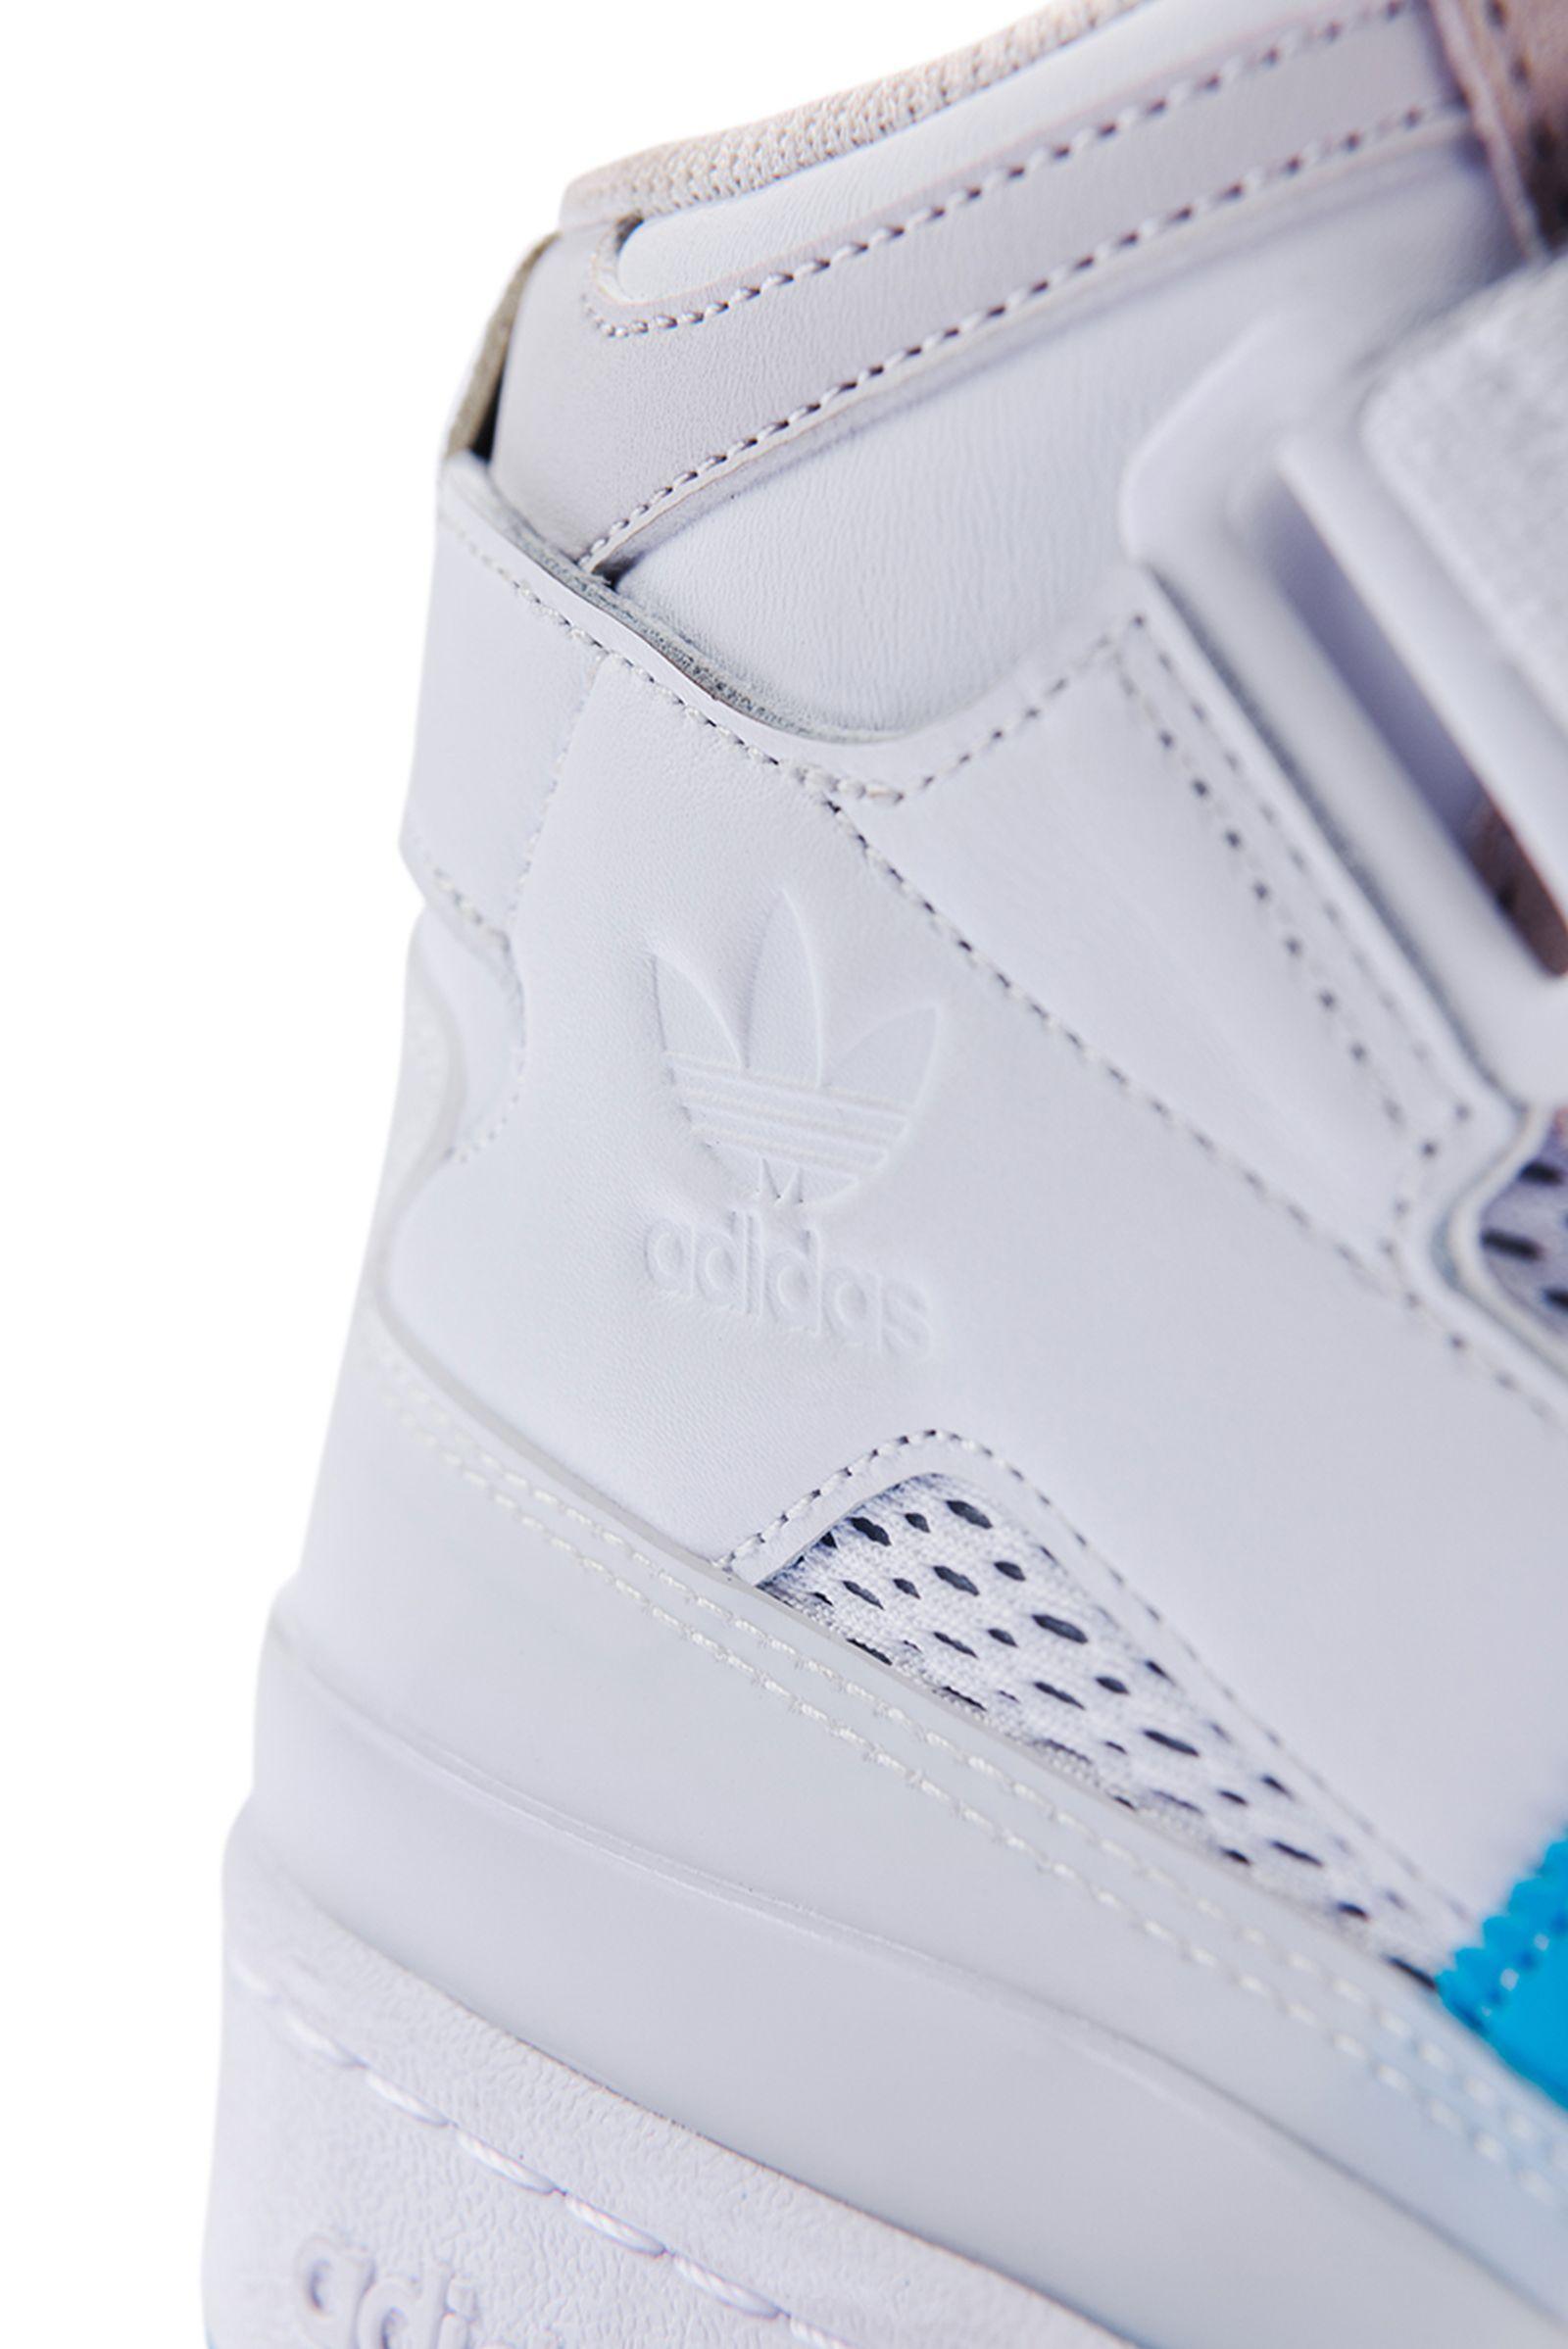 adidas-skateboarding-forum-84-adv-diego-najera-release-date-price-1-009